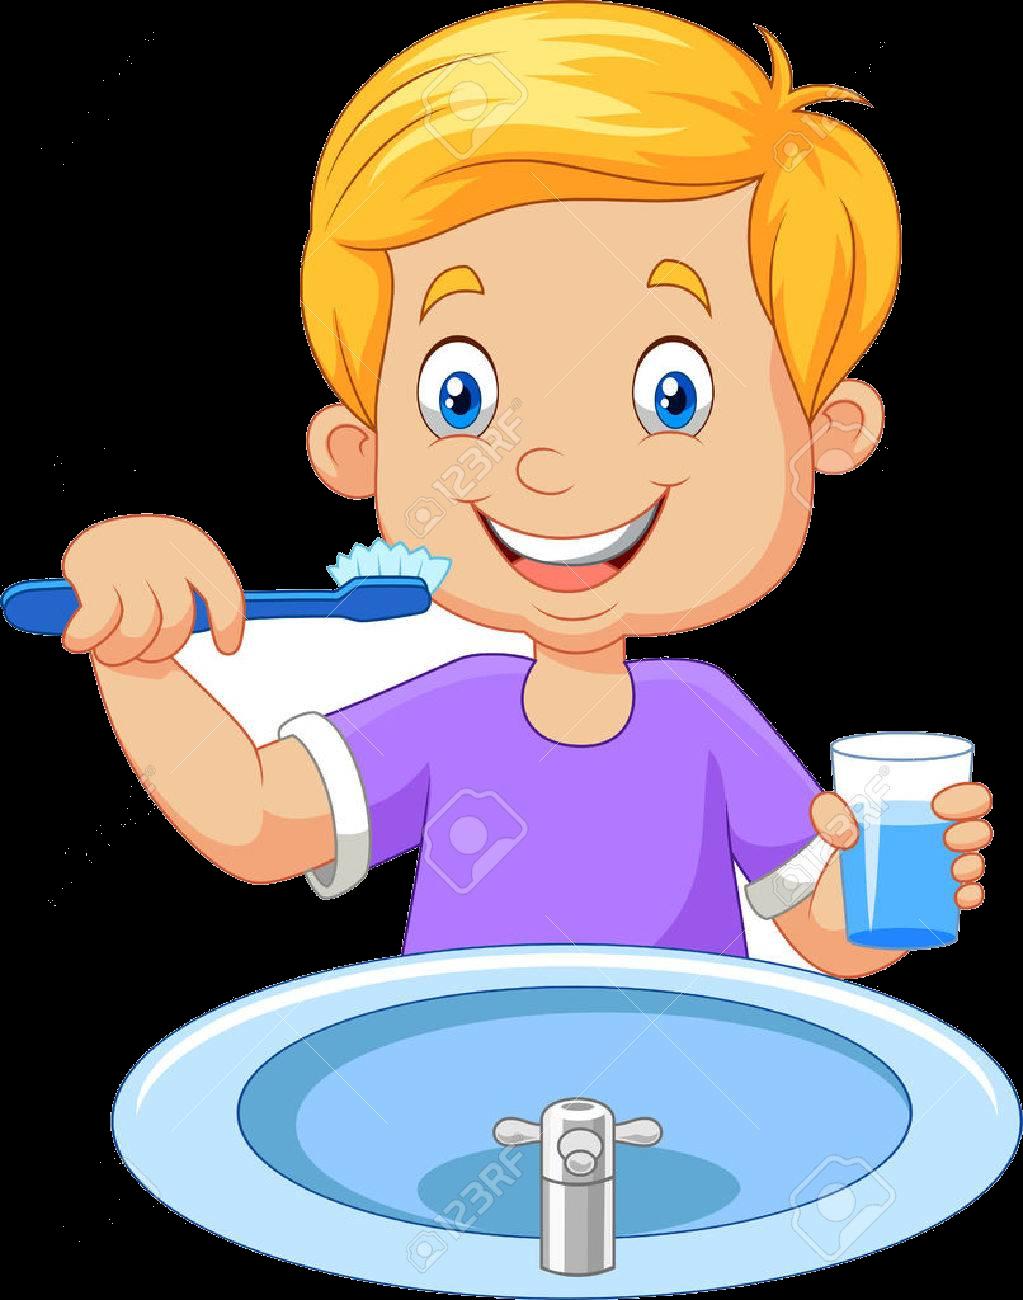 Brush Teeth Boy Brushing Clipart Transparent Png.